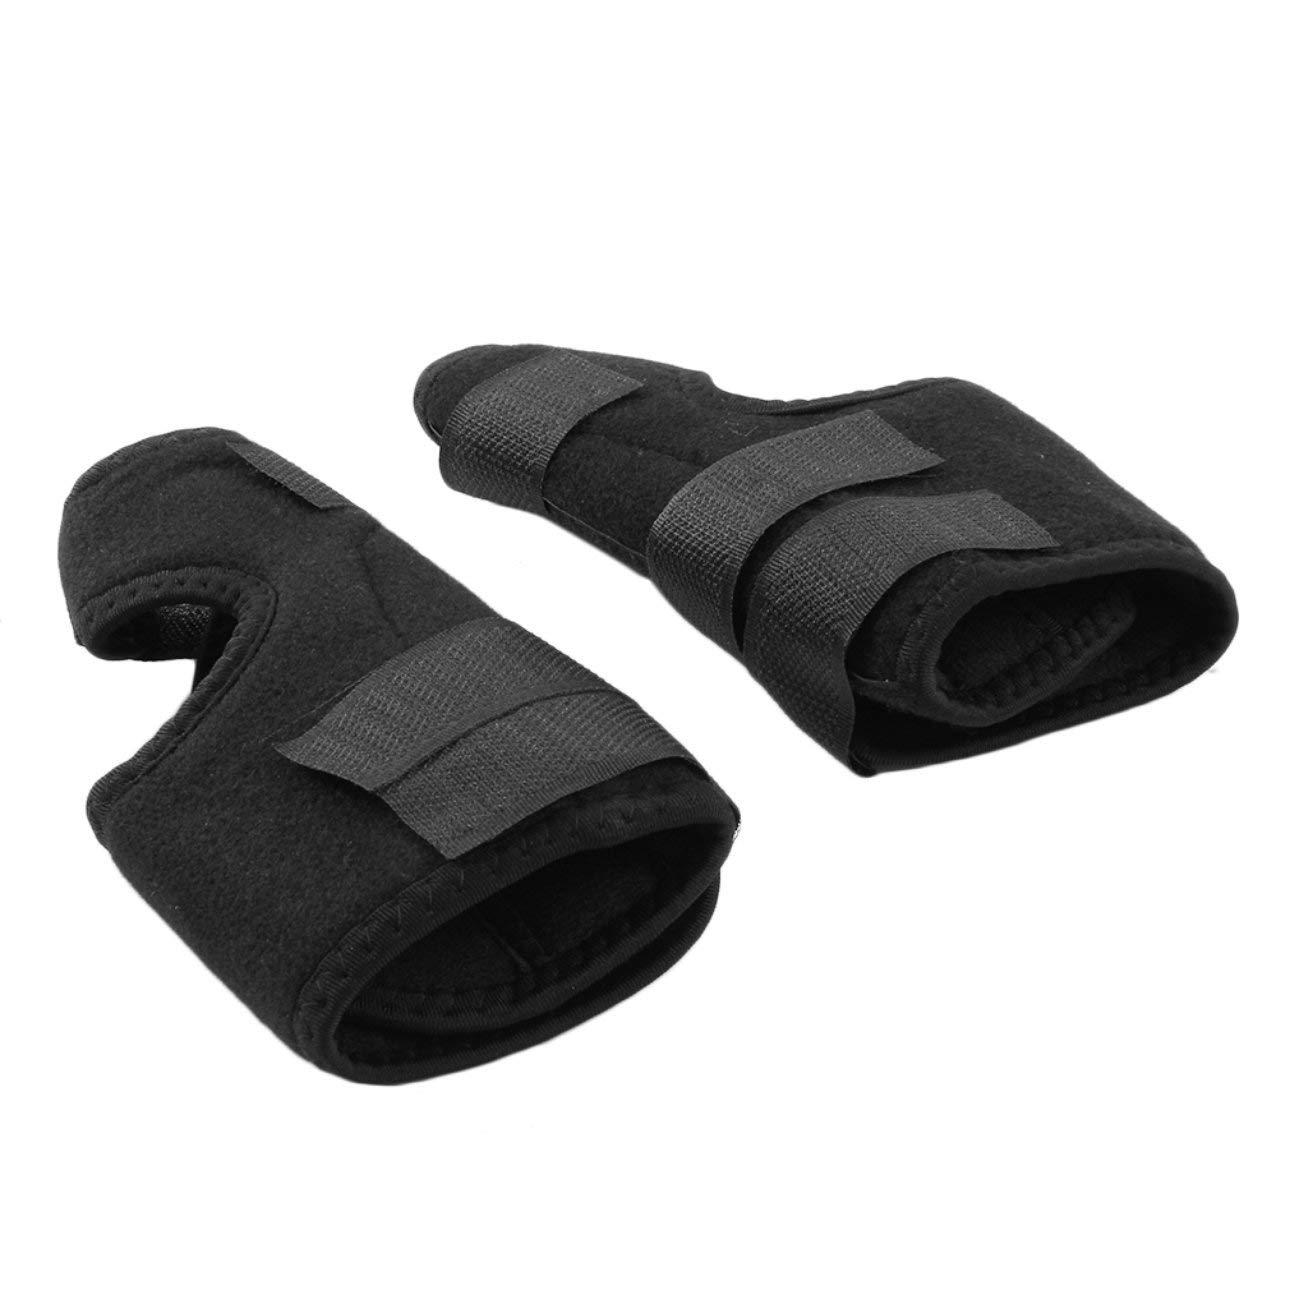 Liobaba 1Pair Soft Bunion Corrector Toe Separator Splint Correction Medical Hallux Valgus Foot Care Pedicure Orthotics Tool